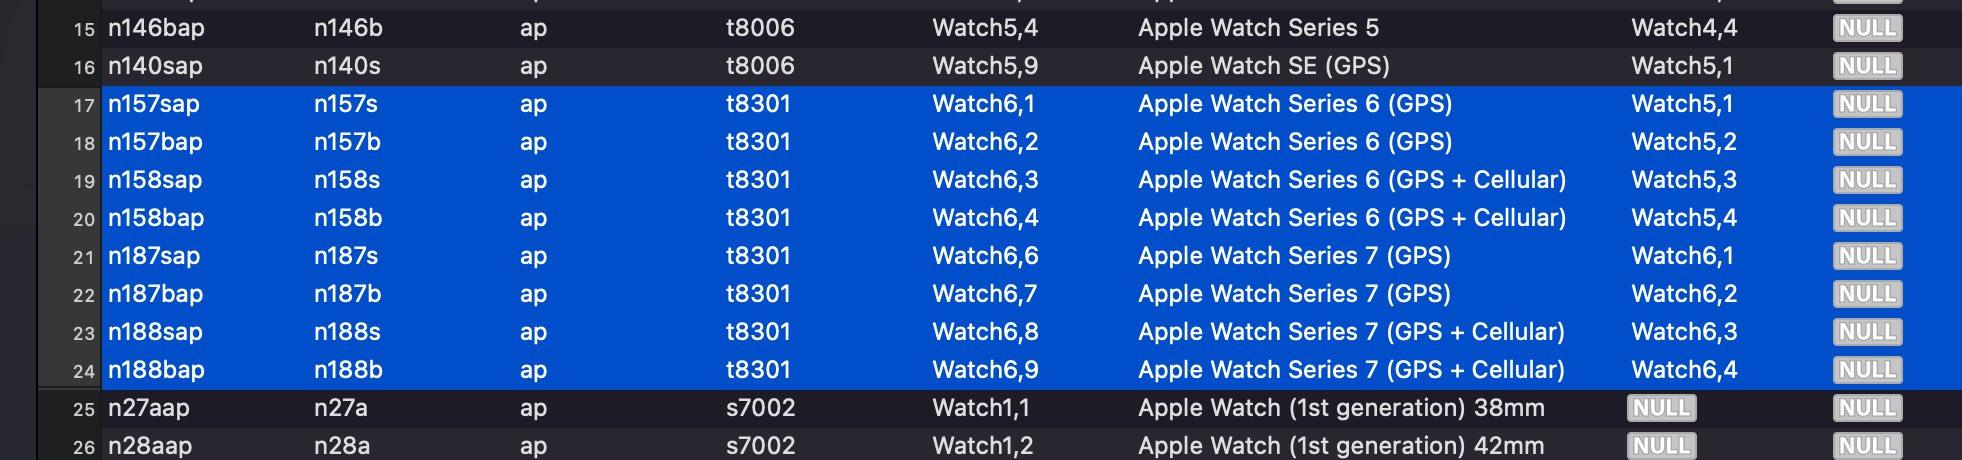 xCode reveal apple watch series 7 processor